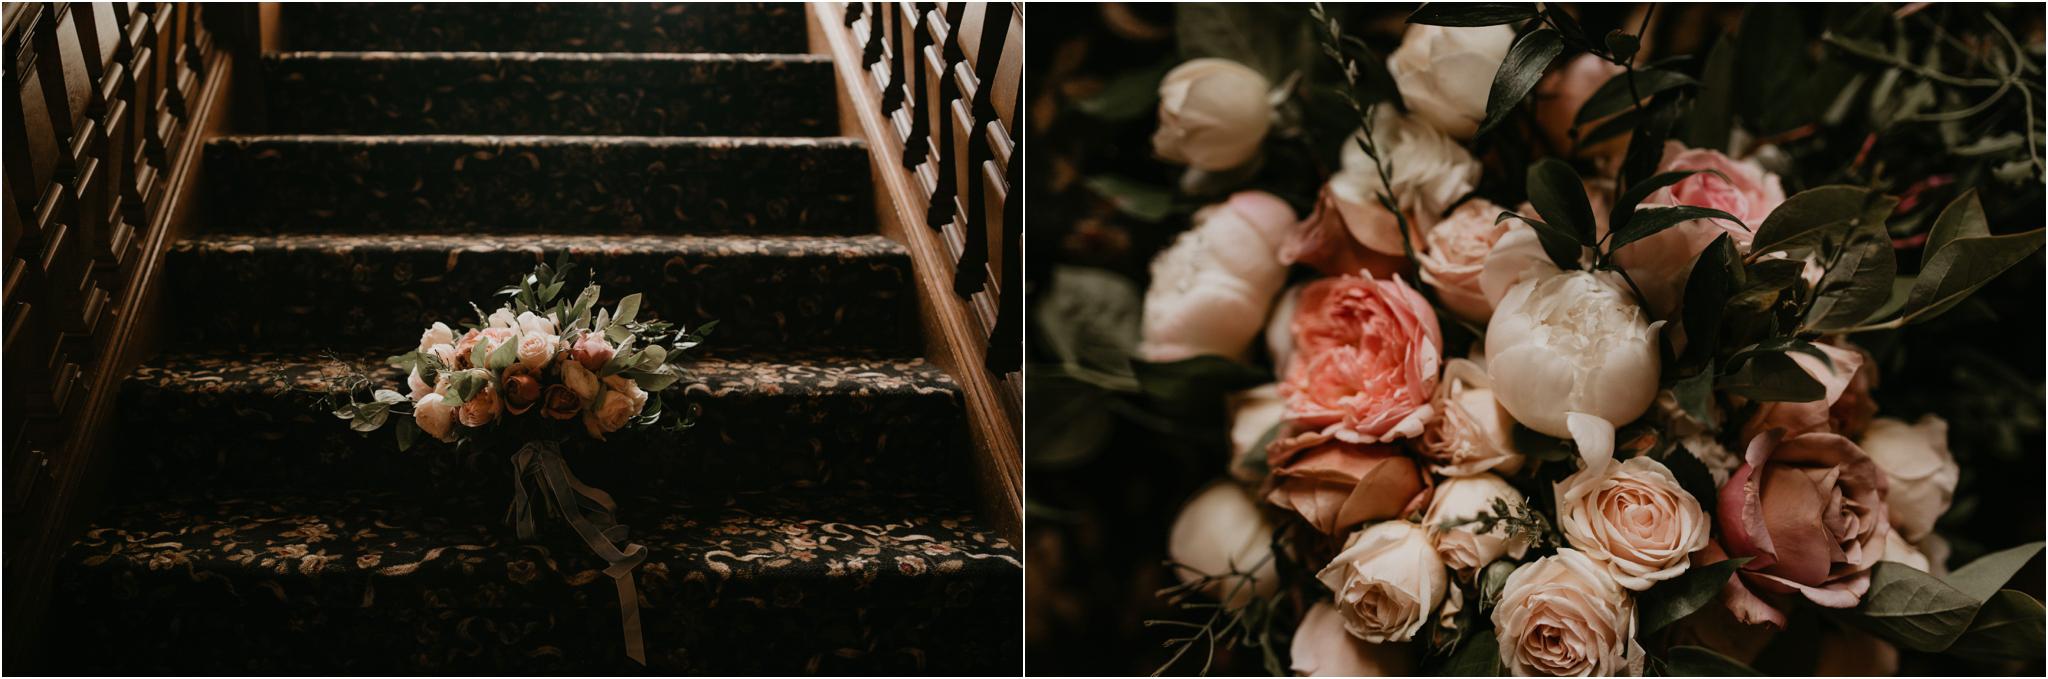 chance-and-ondrea-lairmont-manor-wedding-seattle-photographer-004.jpg